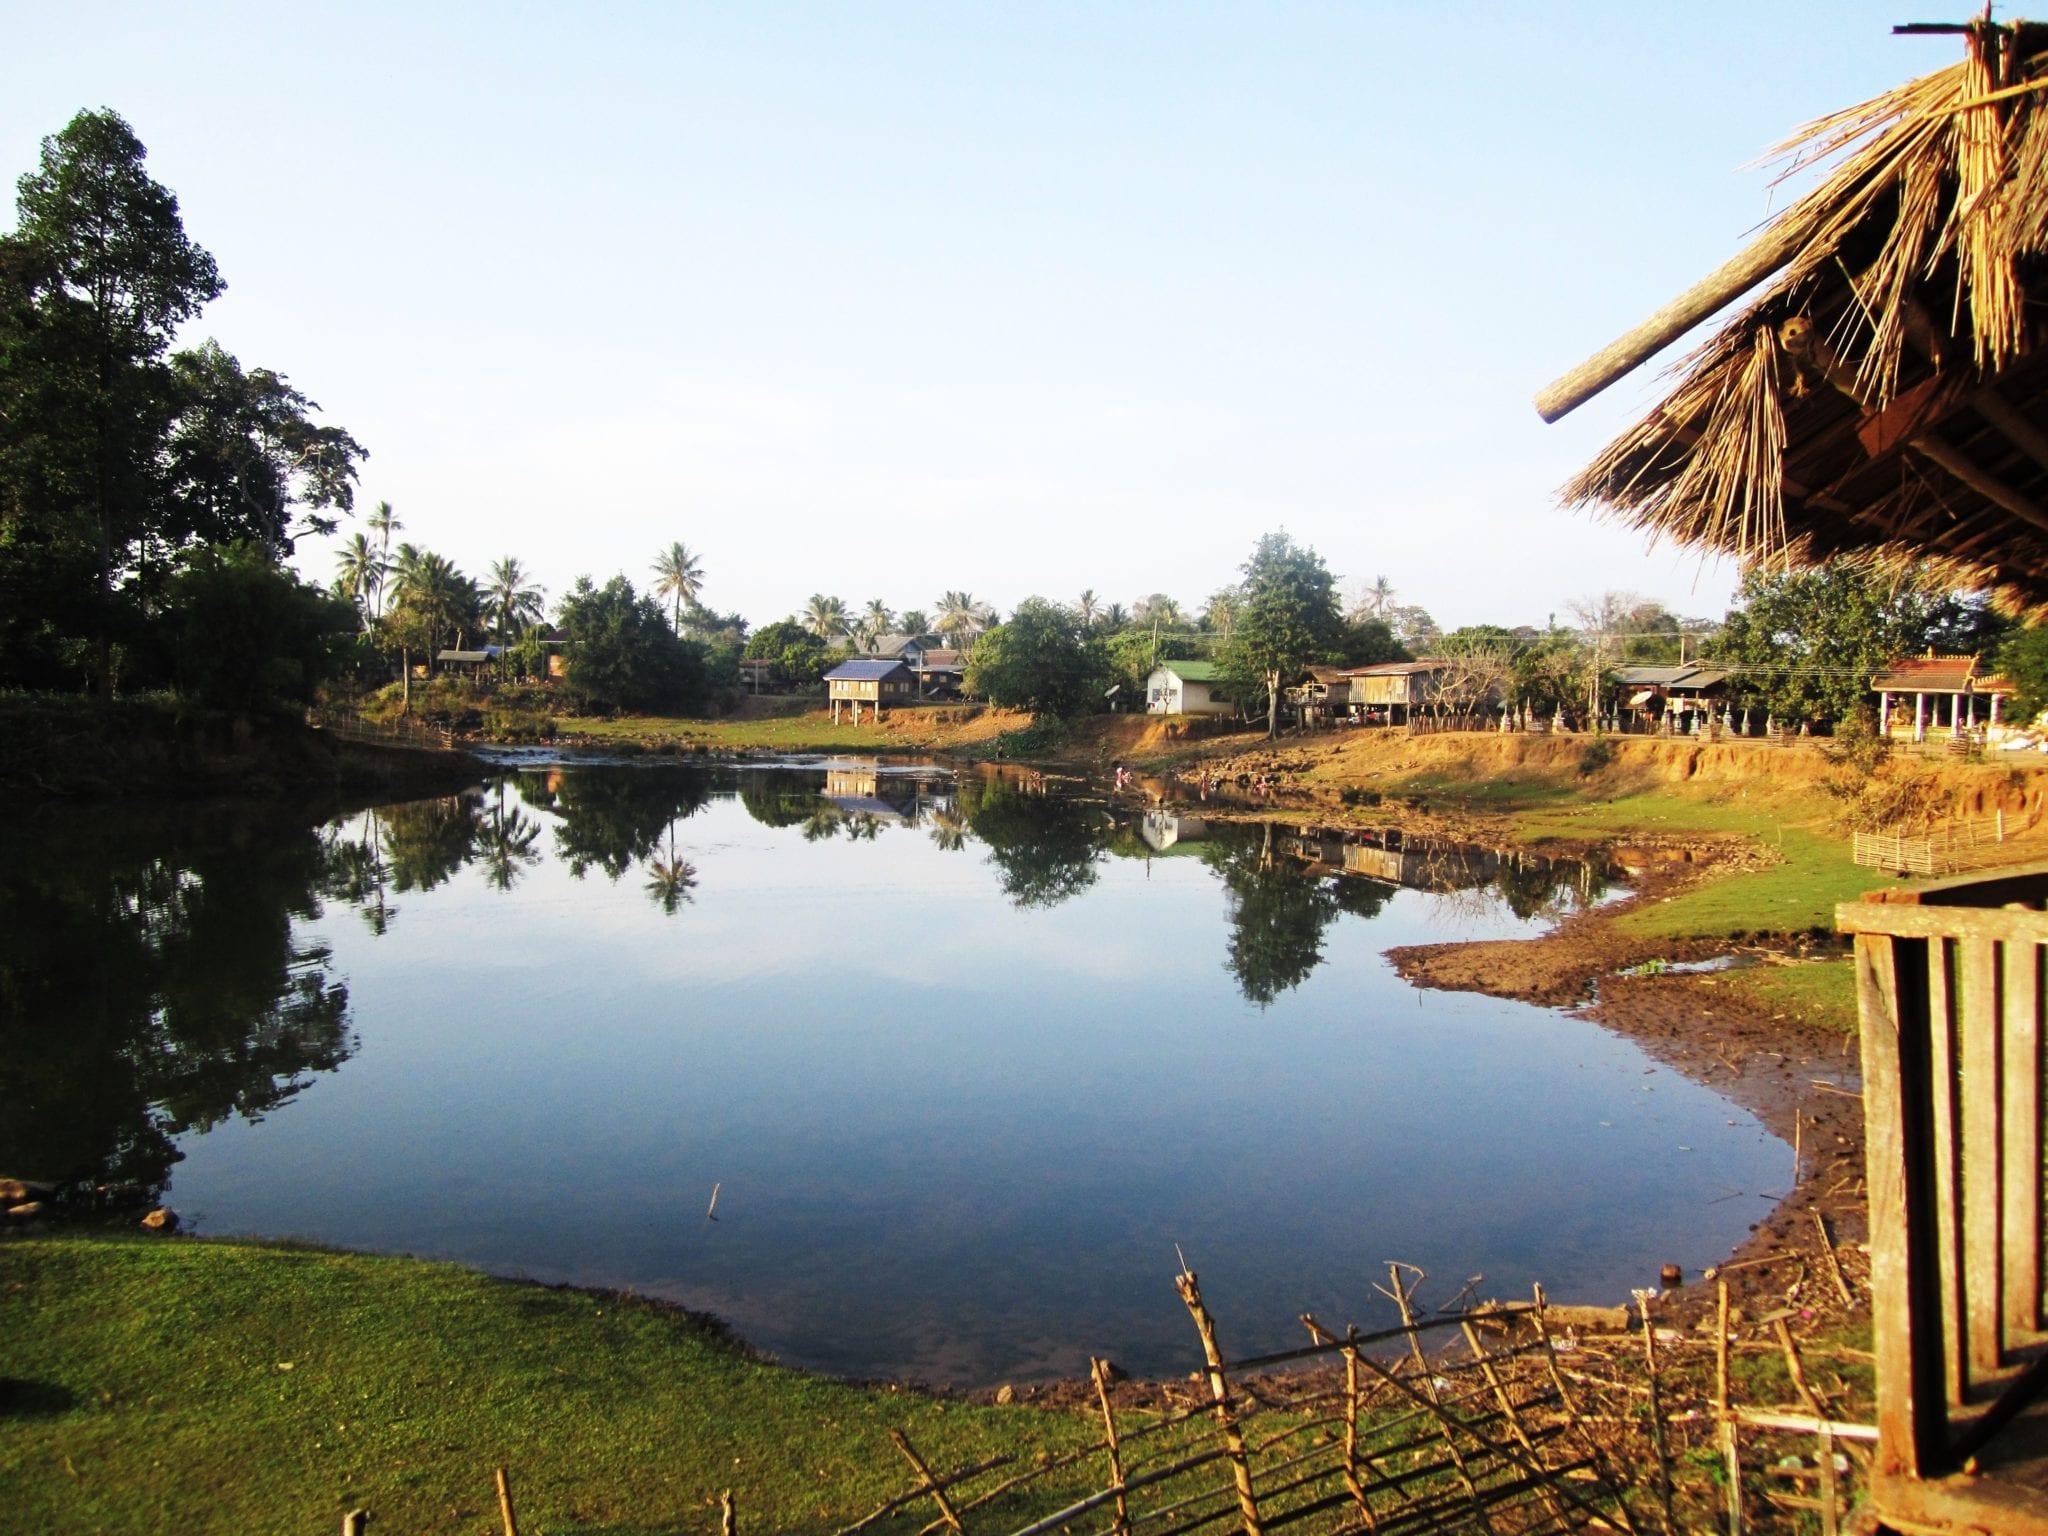 Tat Lo's Lake